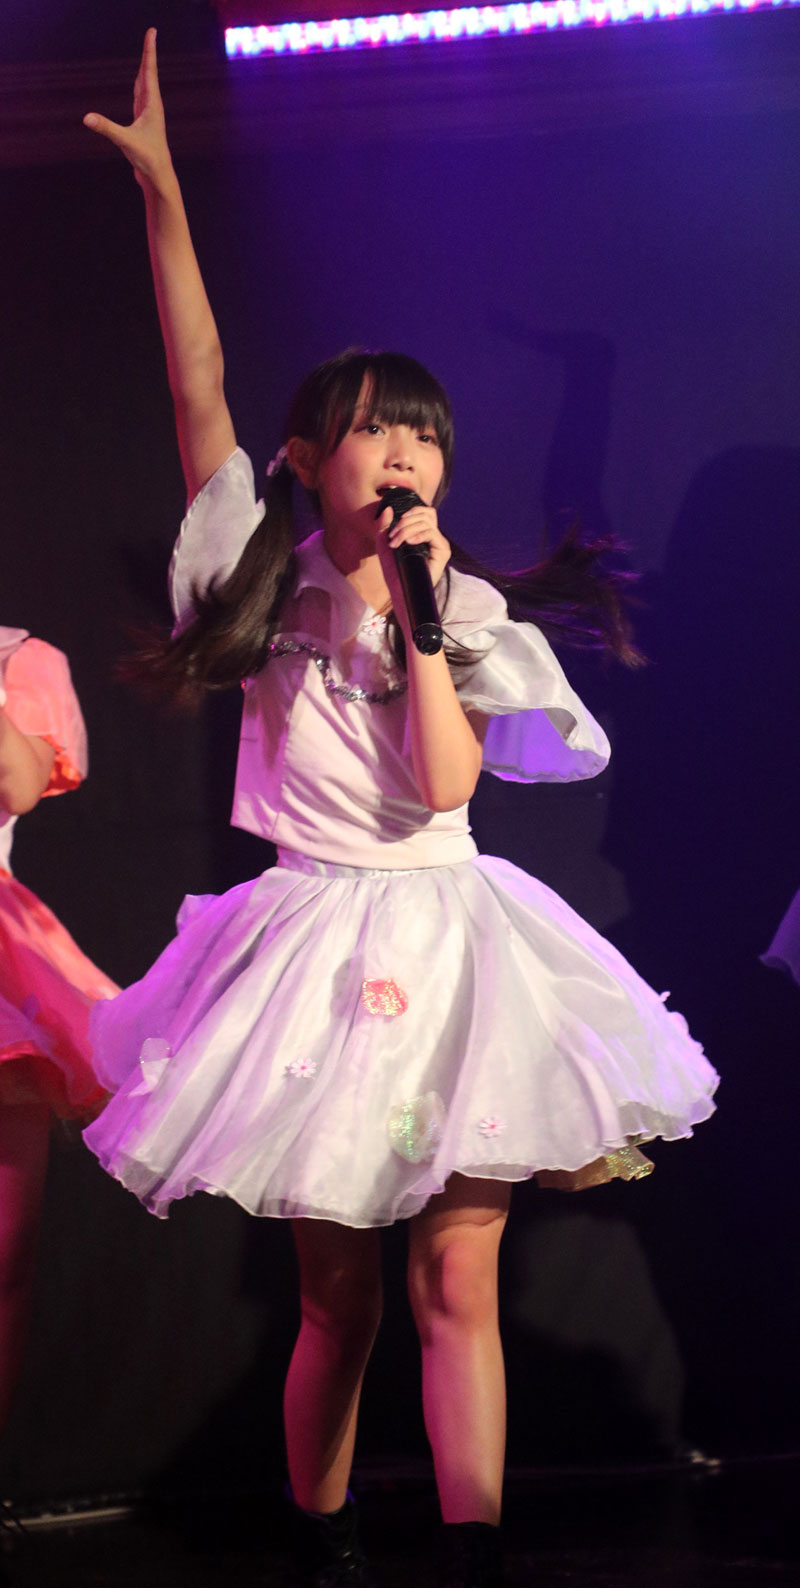 Images : 15番目の画像 - 「dela/ミスマガジングランプリ受賞者・沢口愛華を含む名古屋の人気アイドル・グループが、定例東京公演を開催。切れ味鋭いダンス、多彩な楽曲でファンを魅了」のアルバム - Stereo Sound ONLINE